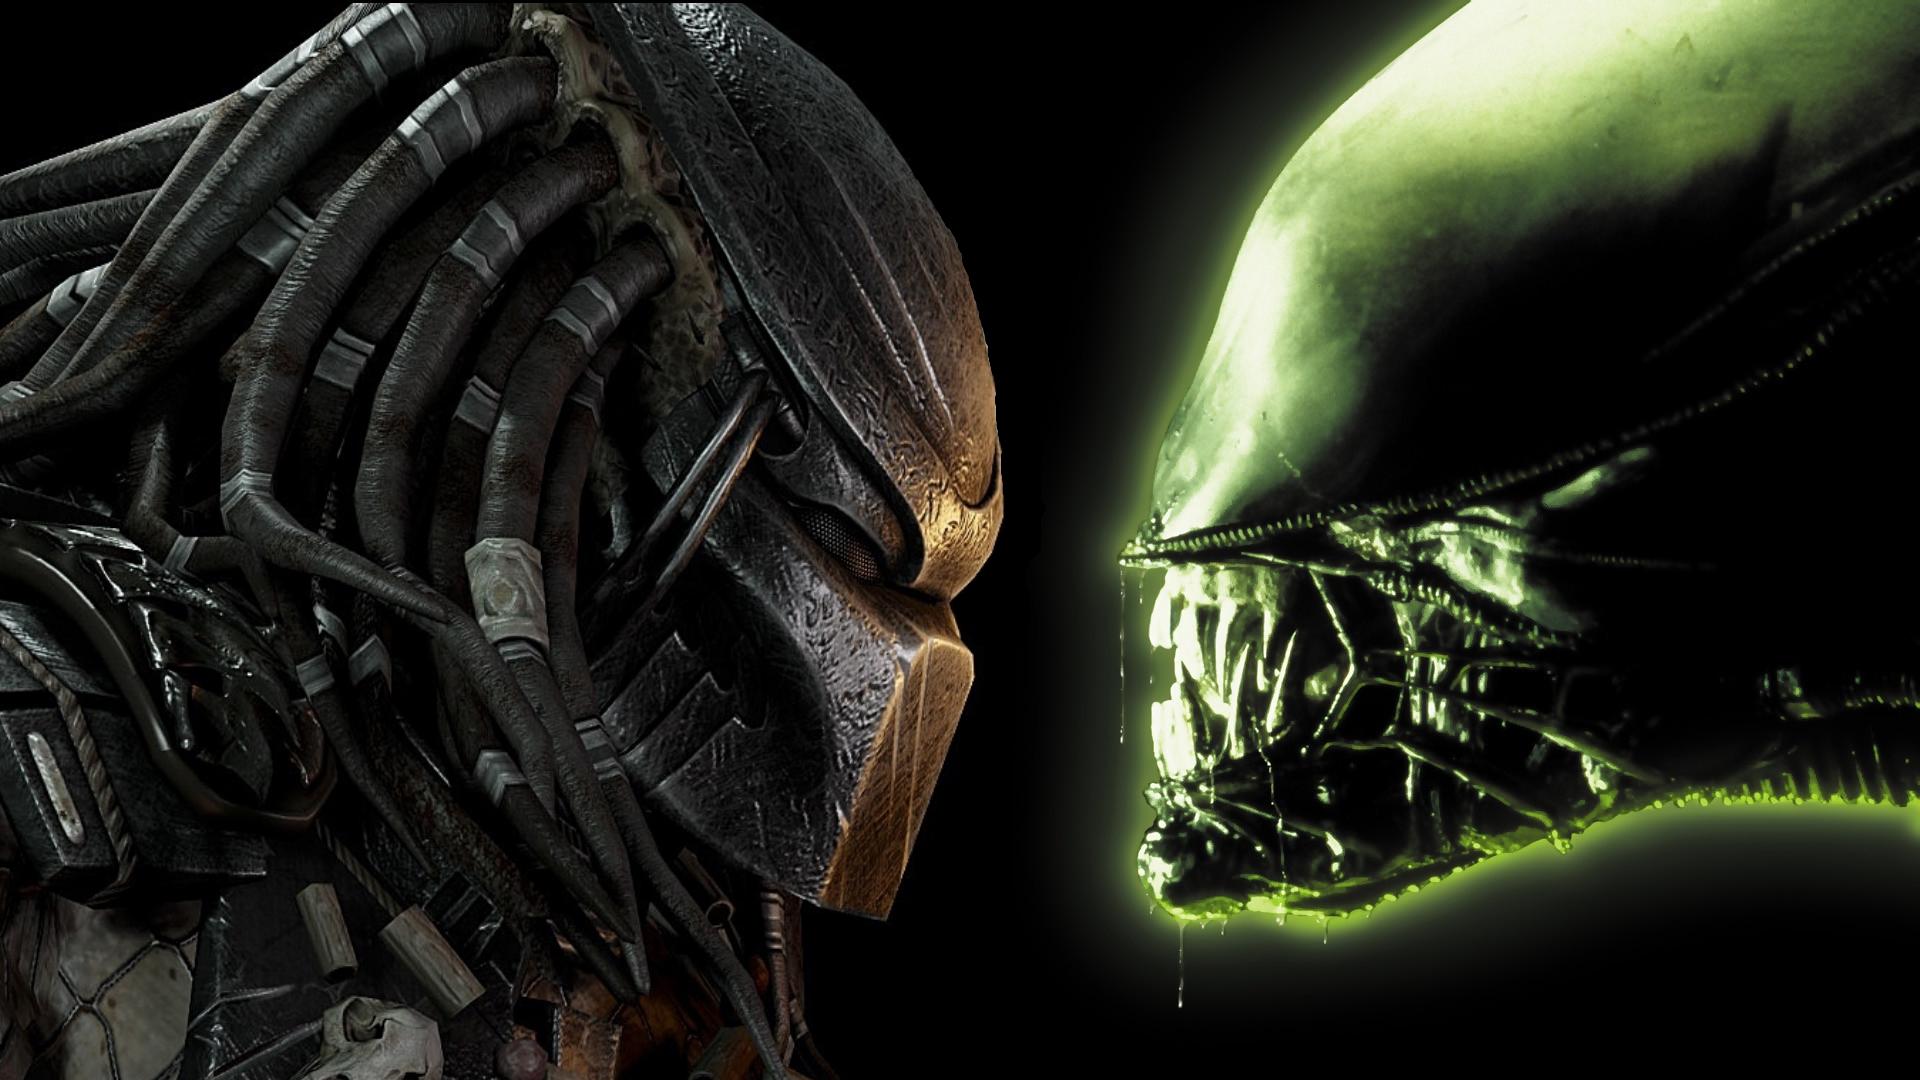 1920_x_1080p_alien_vs_predator_wallpaper_by_xcompactvenom-d6yakik59c0fbcf30dcb